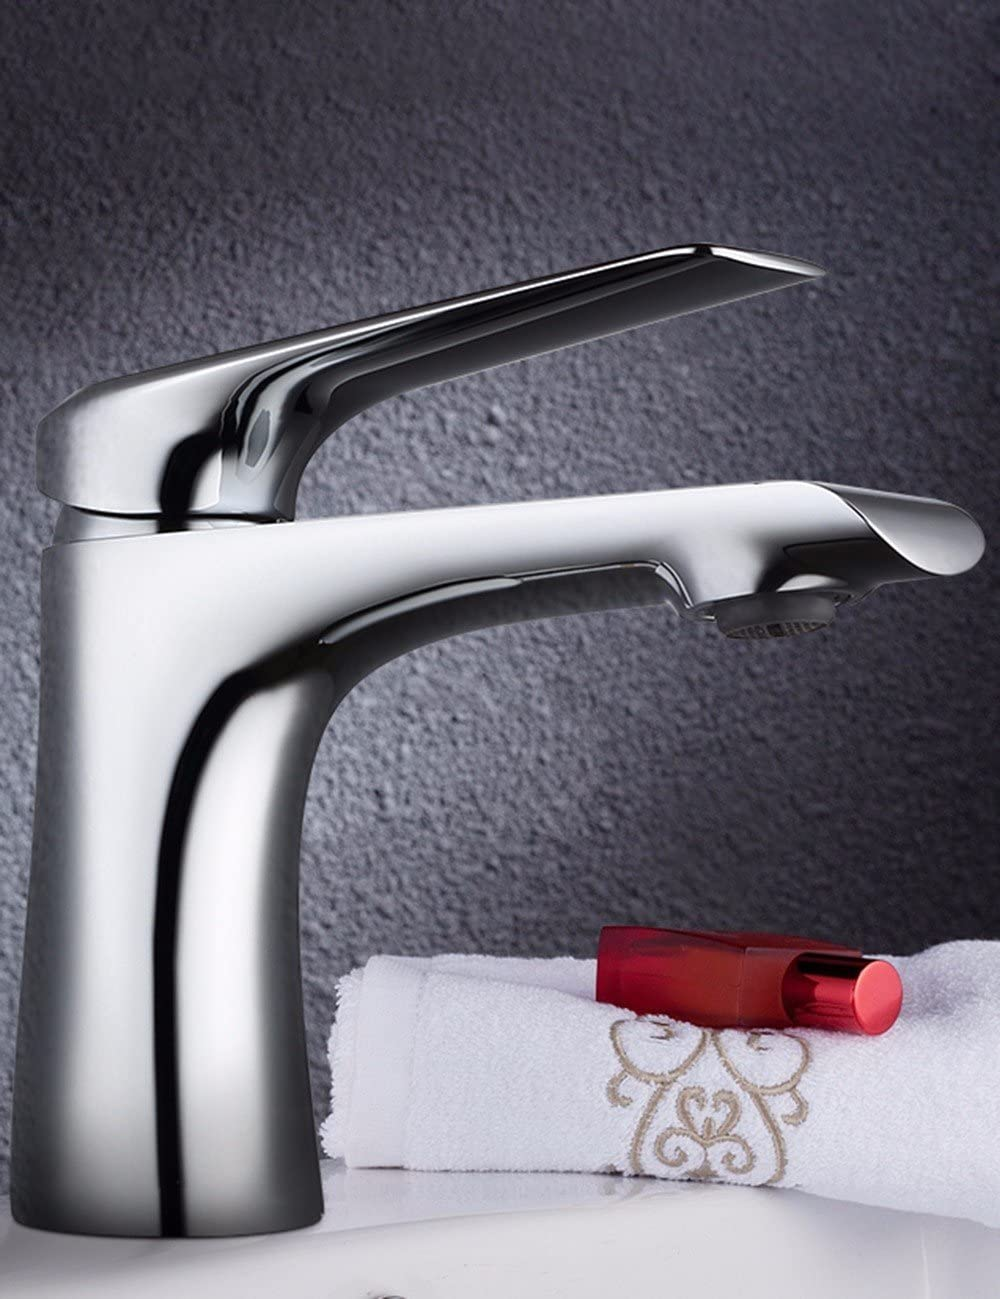 Antique Brass Swivel Spout Bathroom Sink Faucet One Handle Hole Basin Mixer Tap